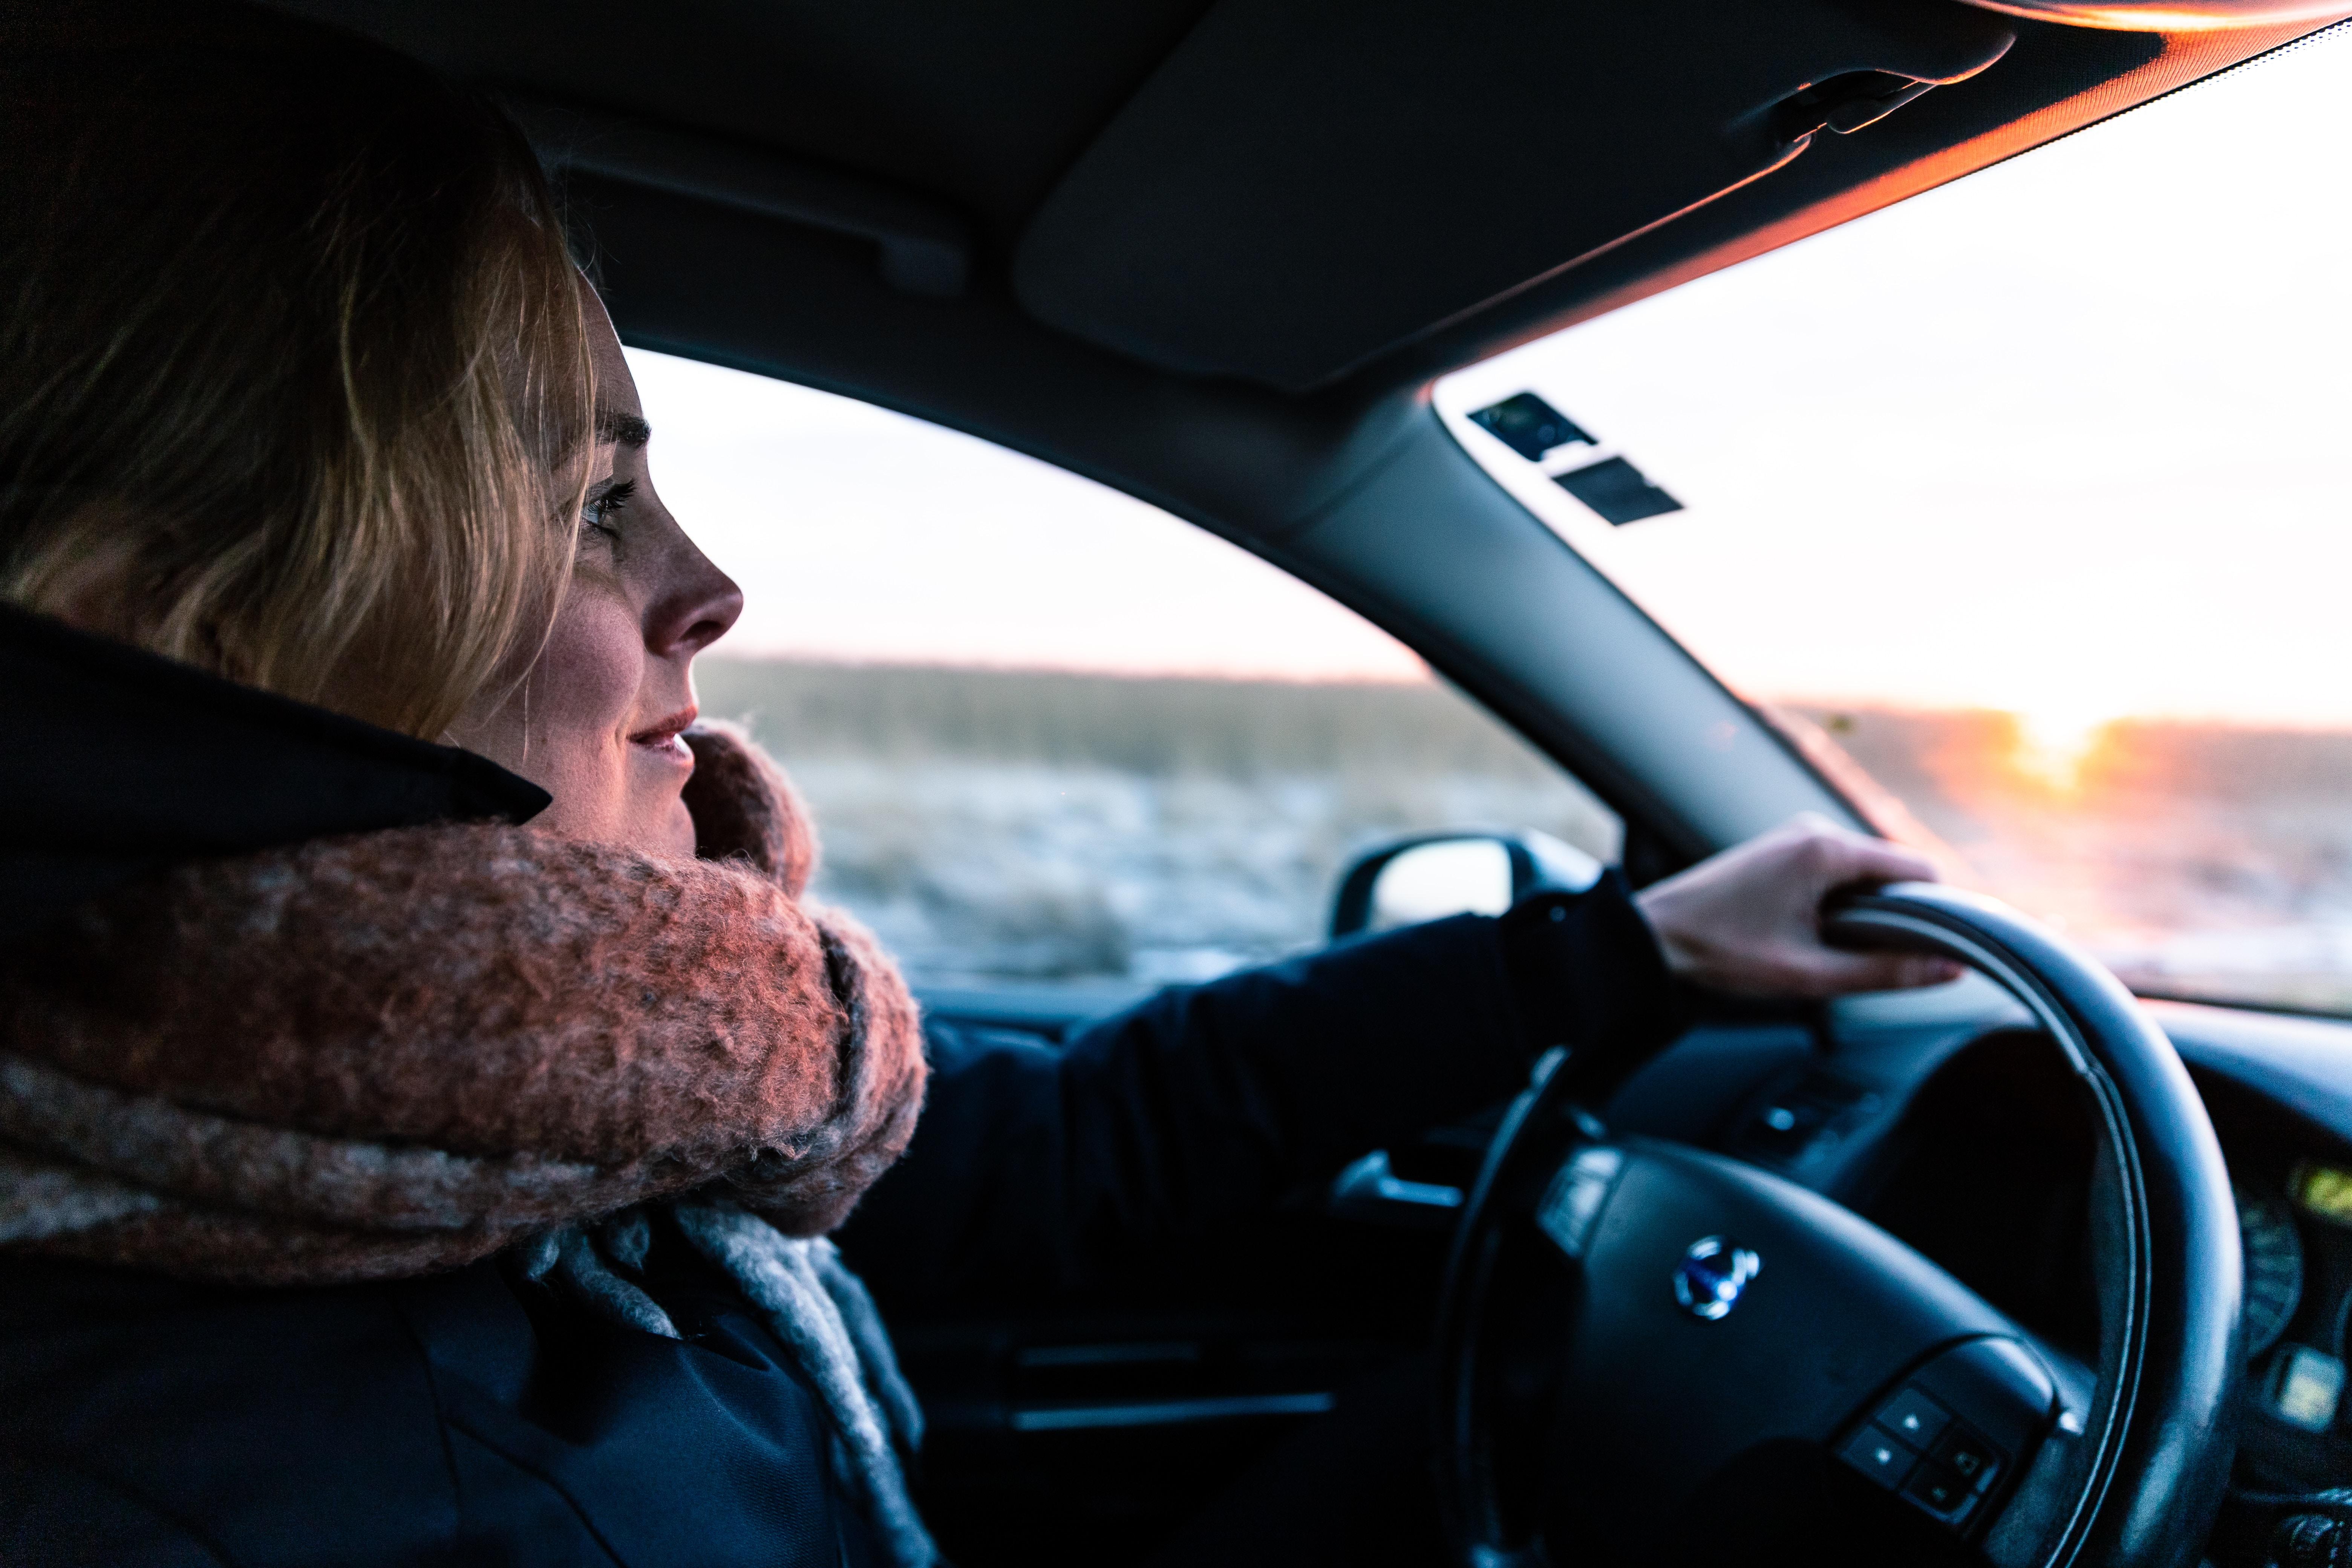 woman driving vehicle during daytime